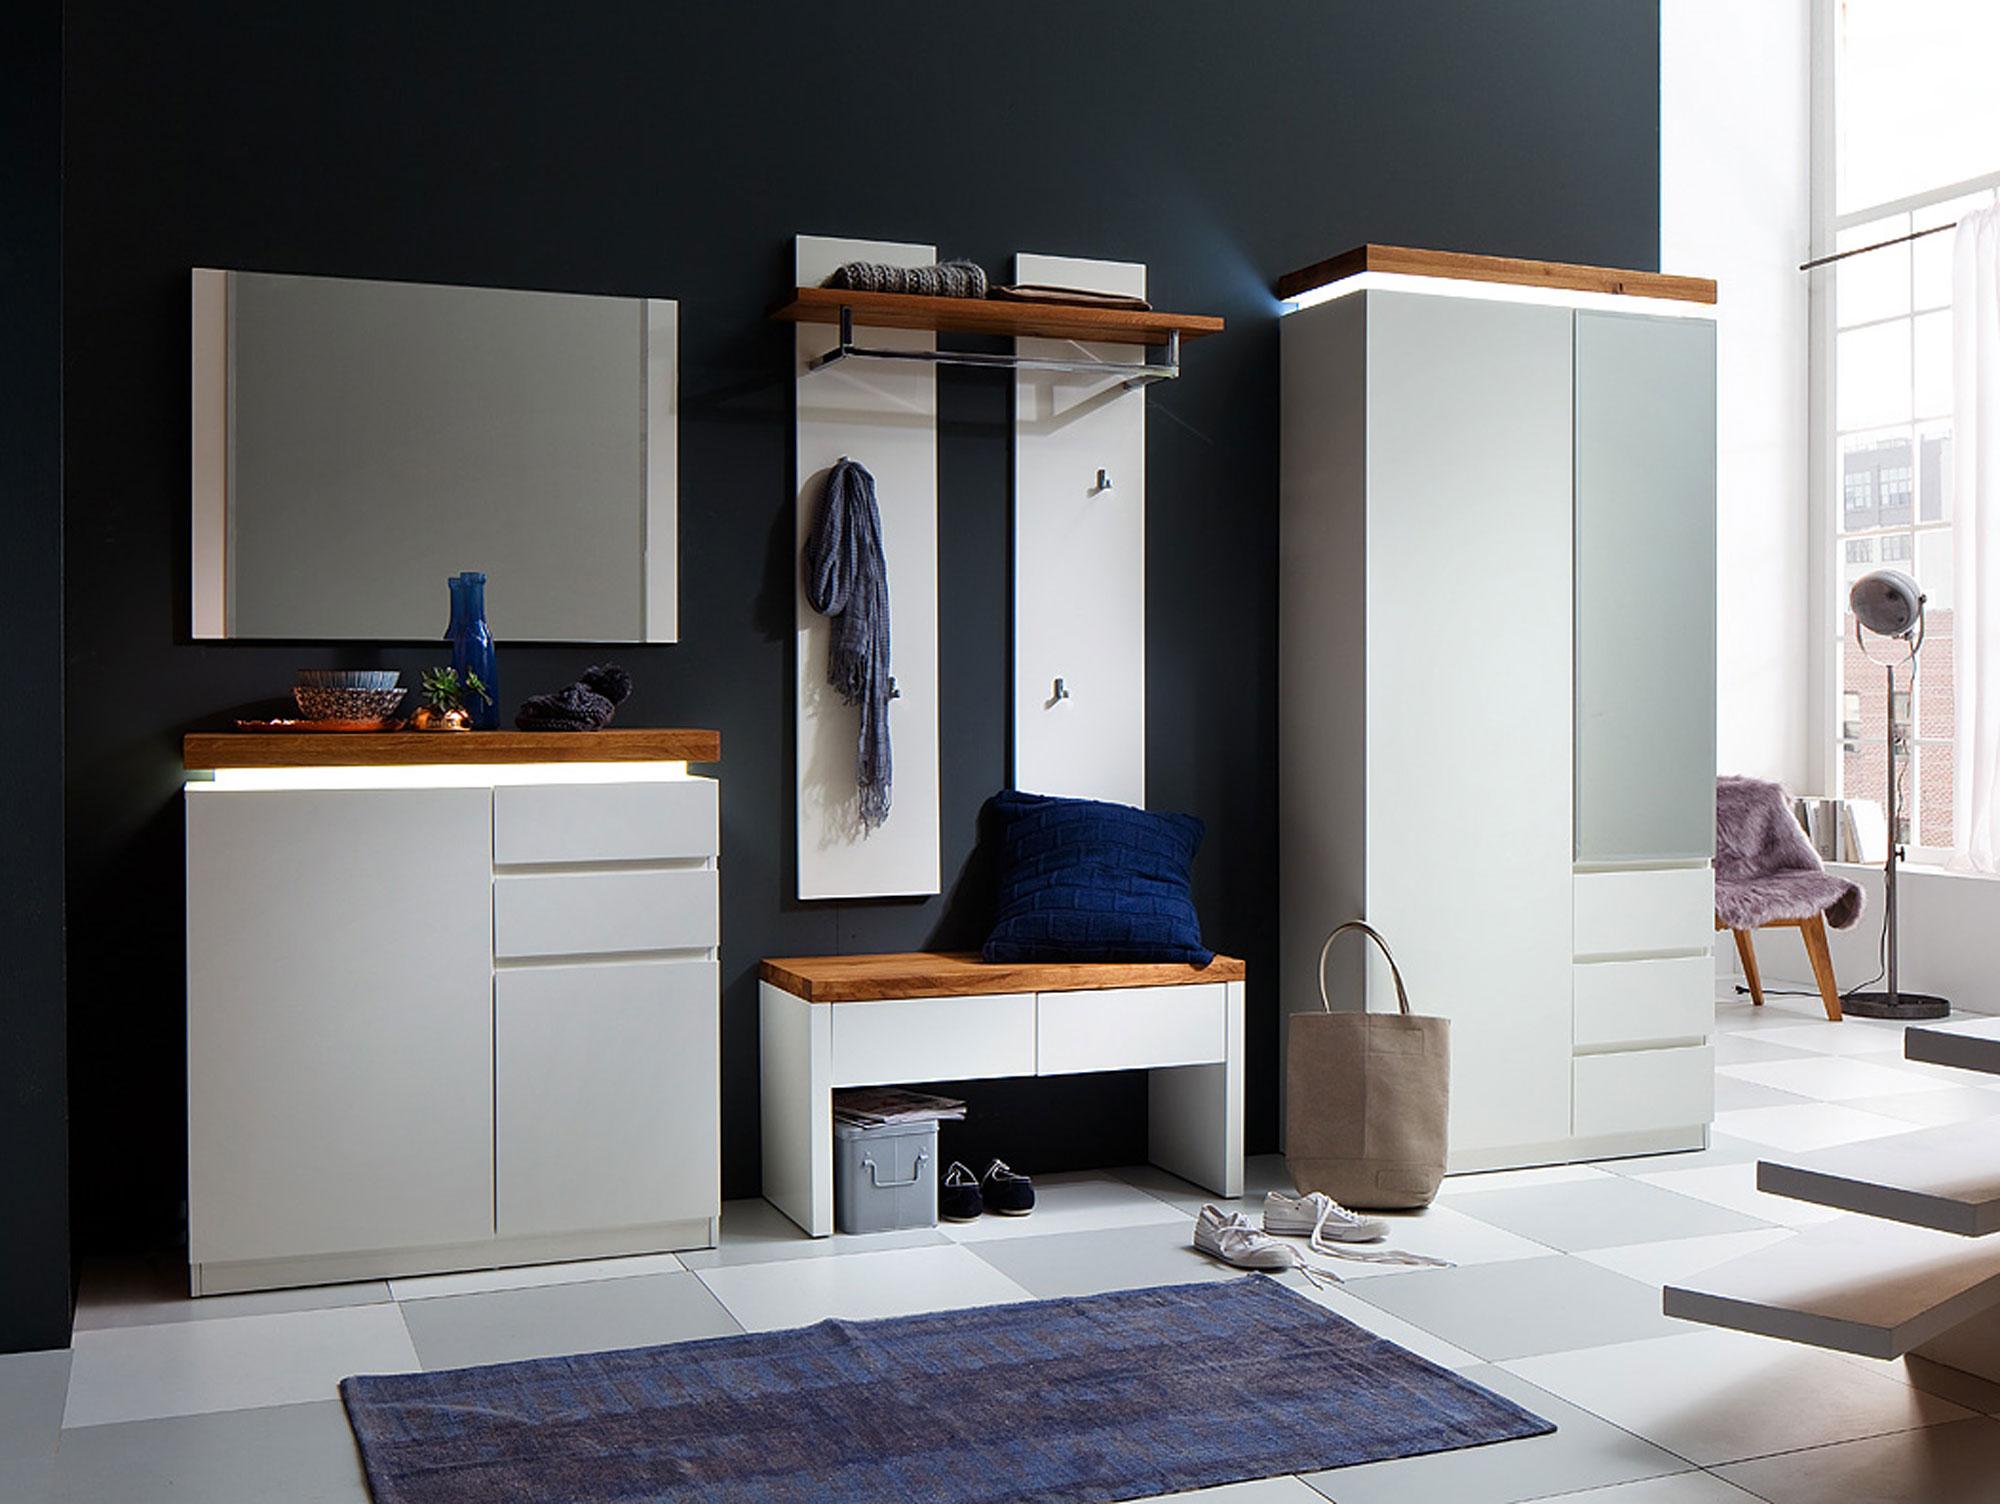 garderobe wandpaneel weiss garderobe komplett spiegel sitzbank kommode wandpaneel wei landhaus. Black Bedroom Furniture Sets. Home Design Ideas